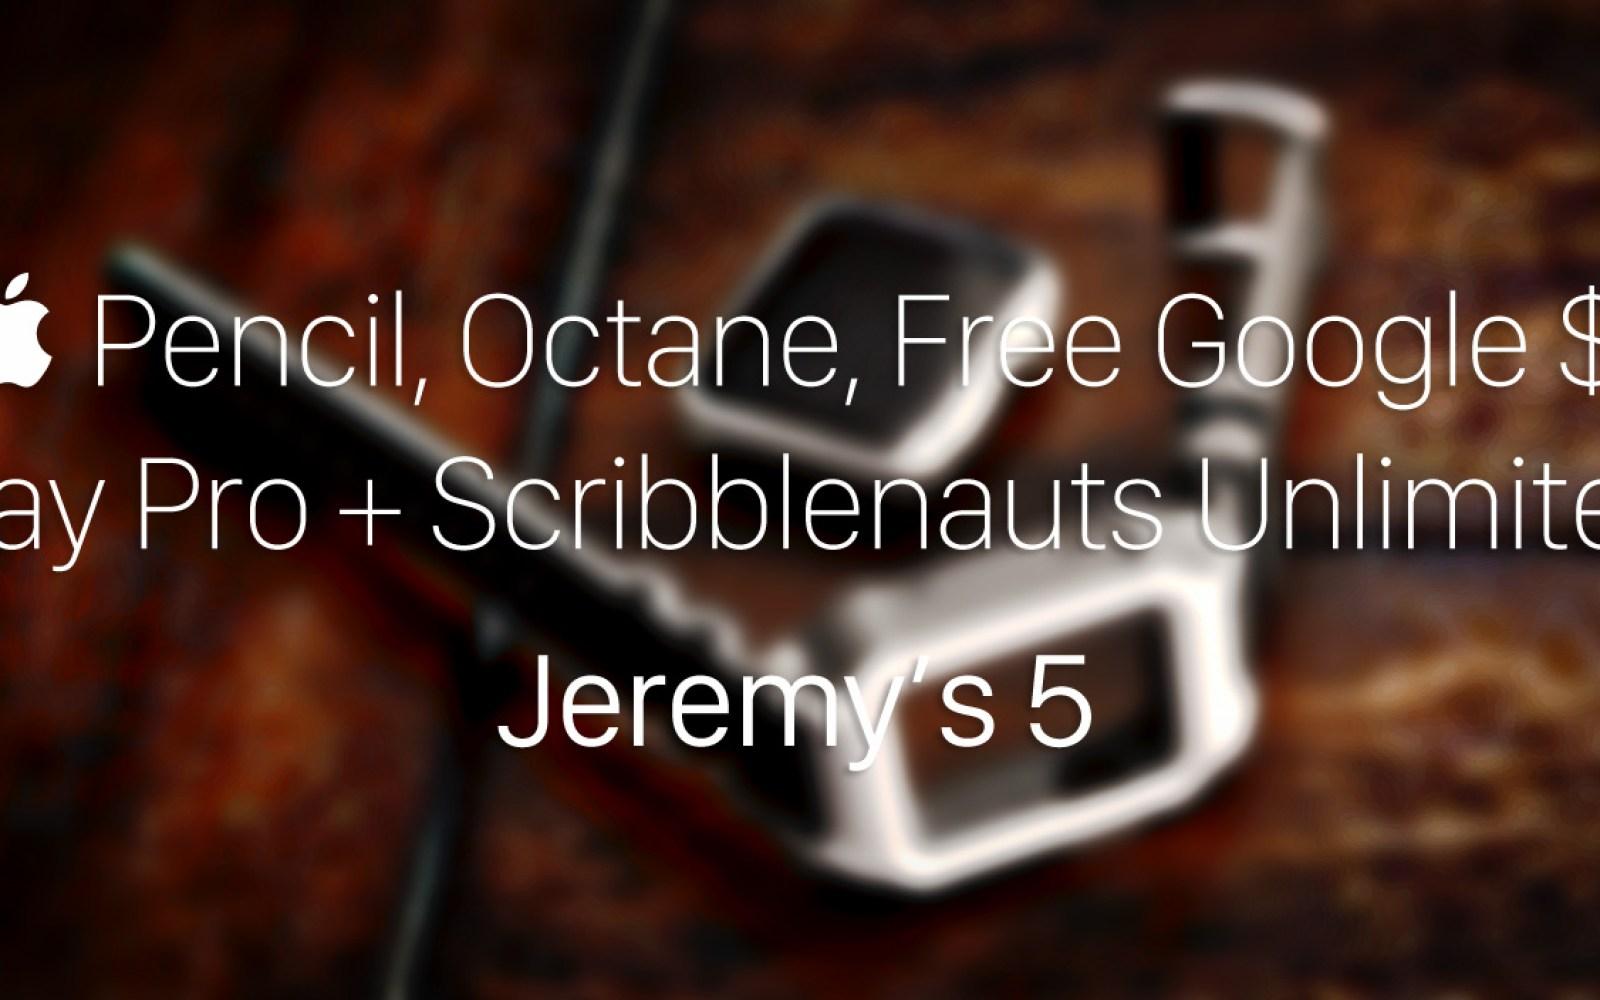 Jeremy's 5: Apple Pencil battery, Octane for Apple Watch, Free Google/Spotify $, djay Pro + Scribblenauts Unlimited